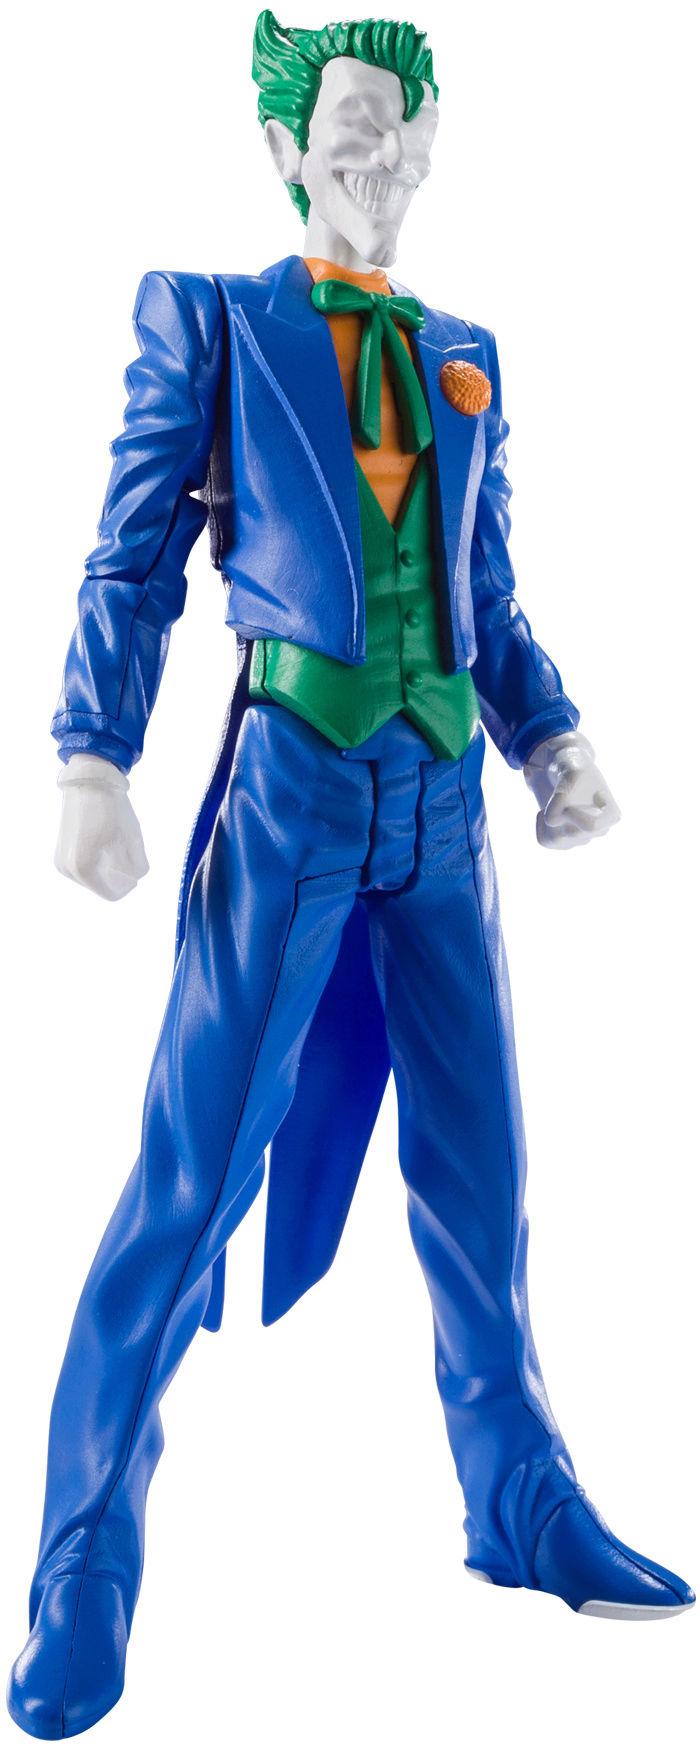 Original Comic The Joker - Level 1 (Sprukits-Bandai) Joker-13